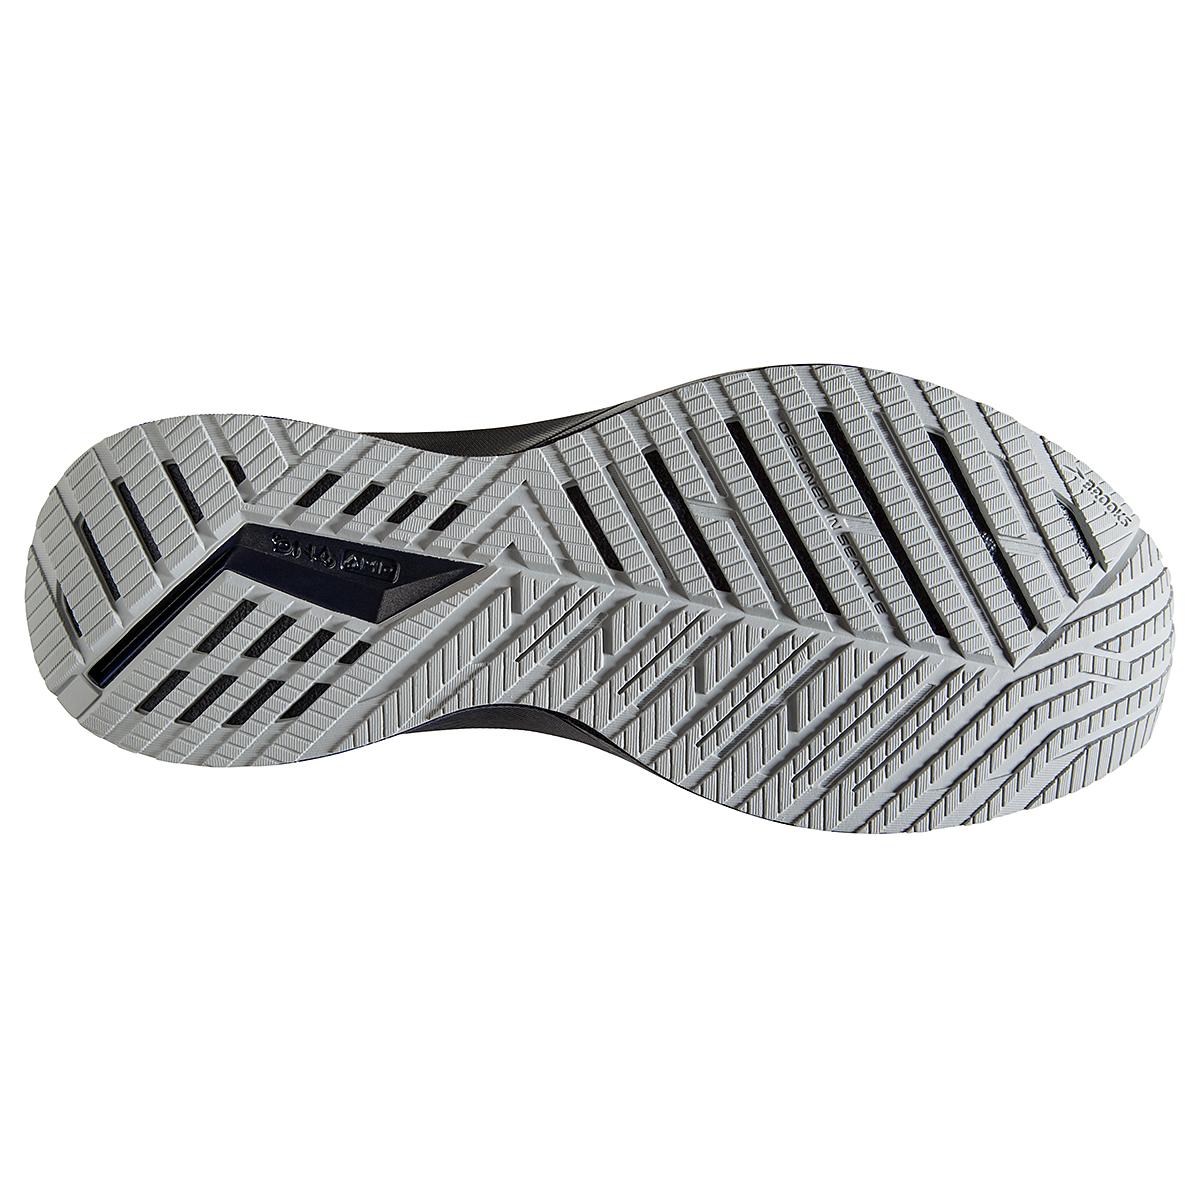 Men's Brooks Levitate Stealthfit 5 Running Shoe - Color: Peacoat/Grey - Size: 7 - Width: Regular, Peacoat/Grey, large, image 6